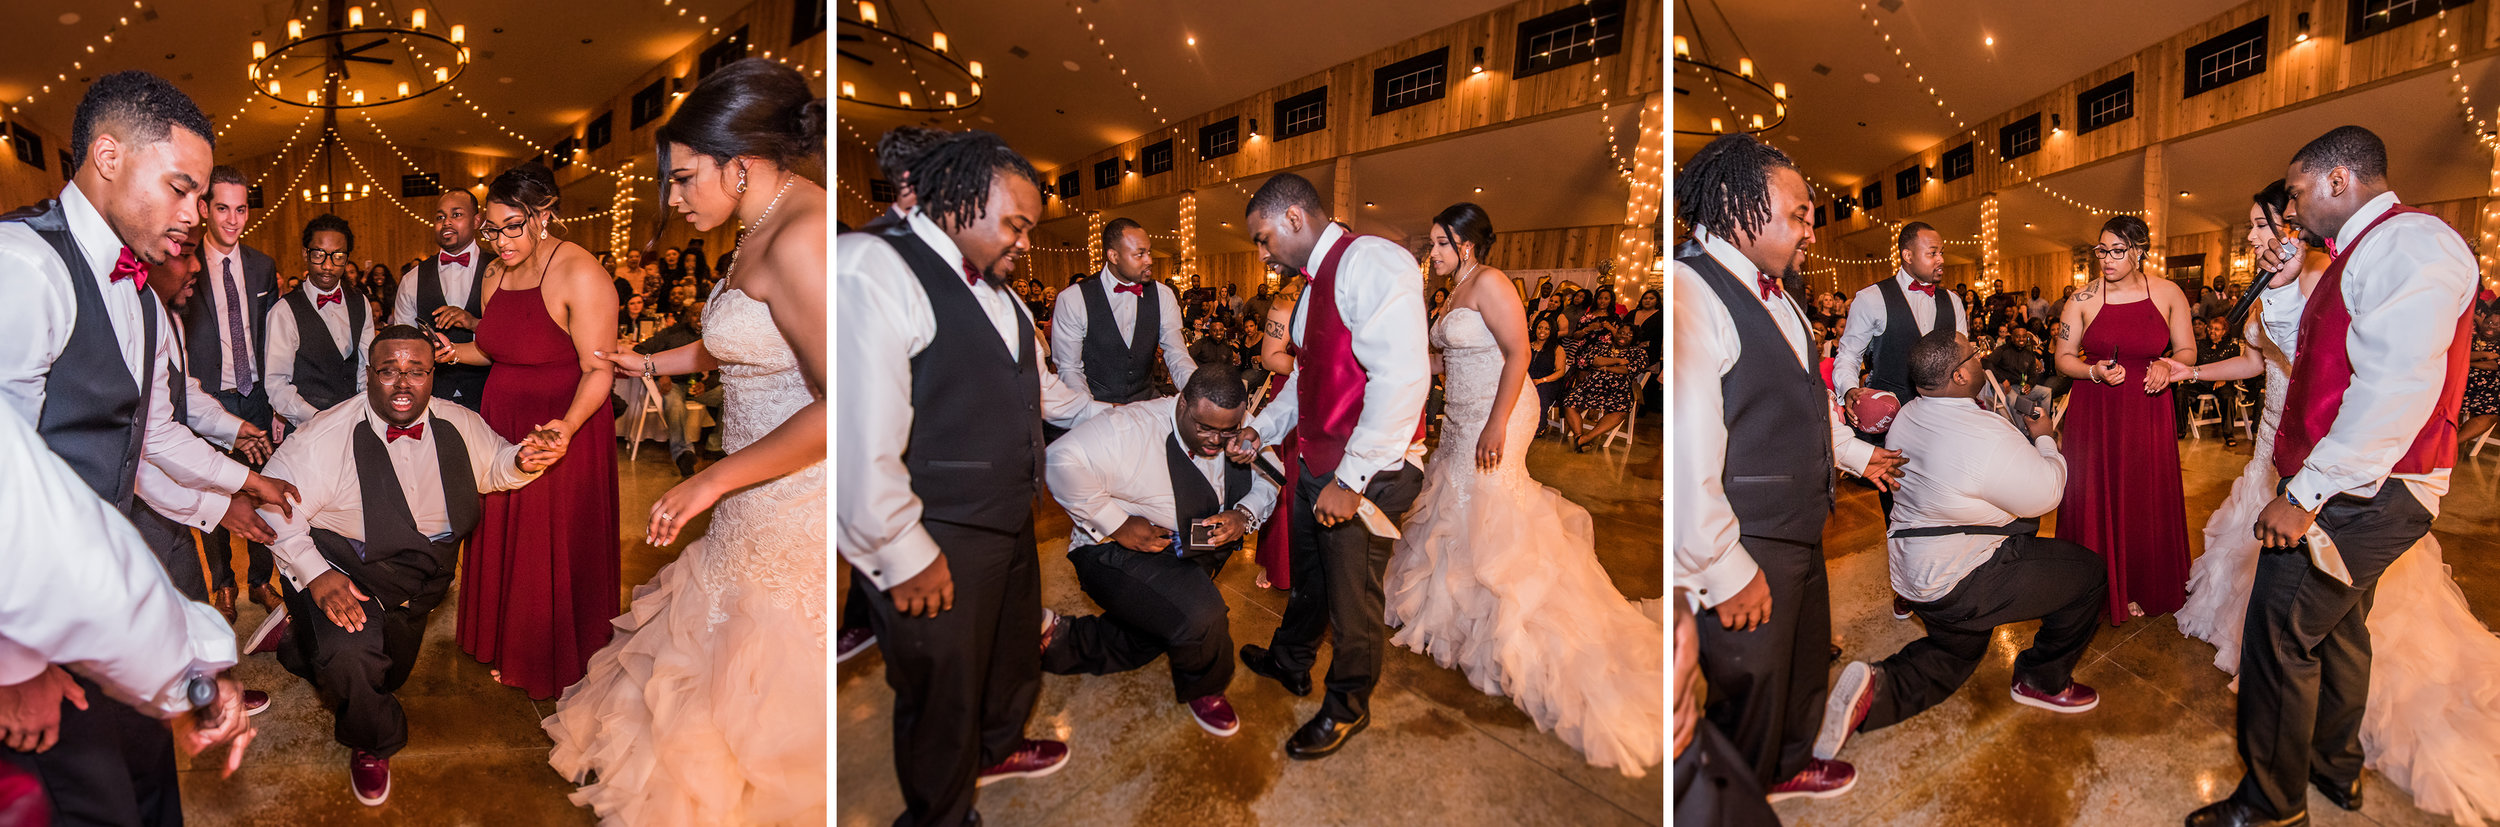 Burlington Iowa Wedding Midwest Photographer Melissa Cervantes _ Chantelle and Isaiah 335555.jpg